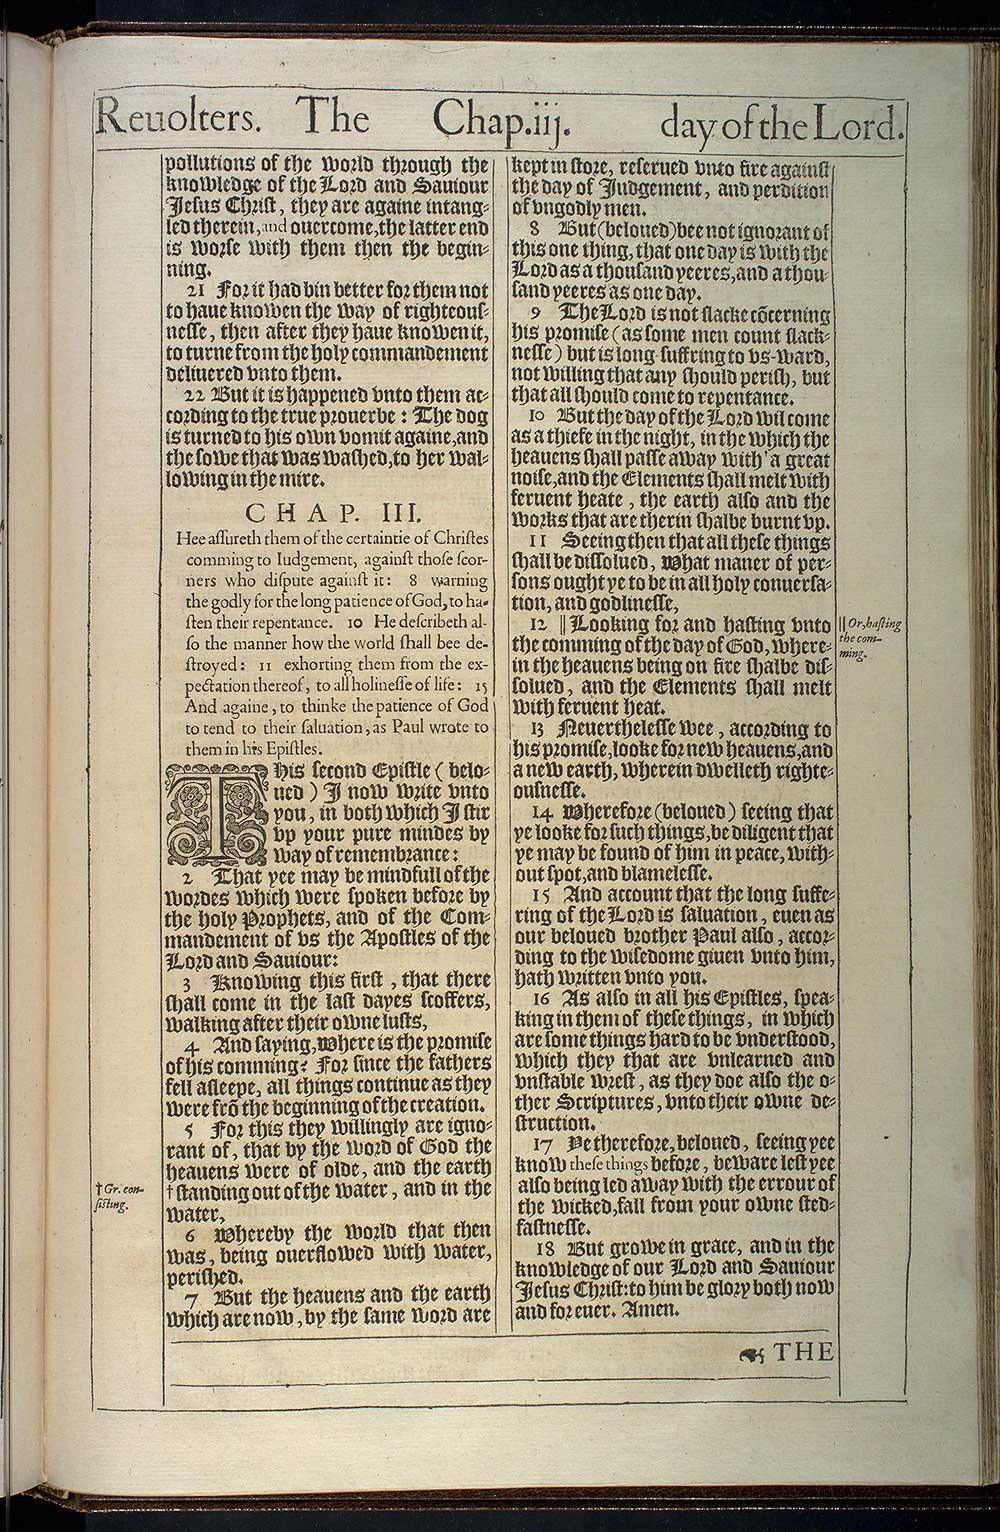 2 Peter Chapter 3 Original 1611 Bible Scan